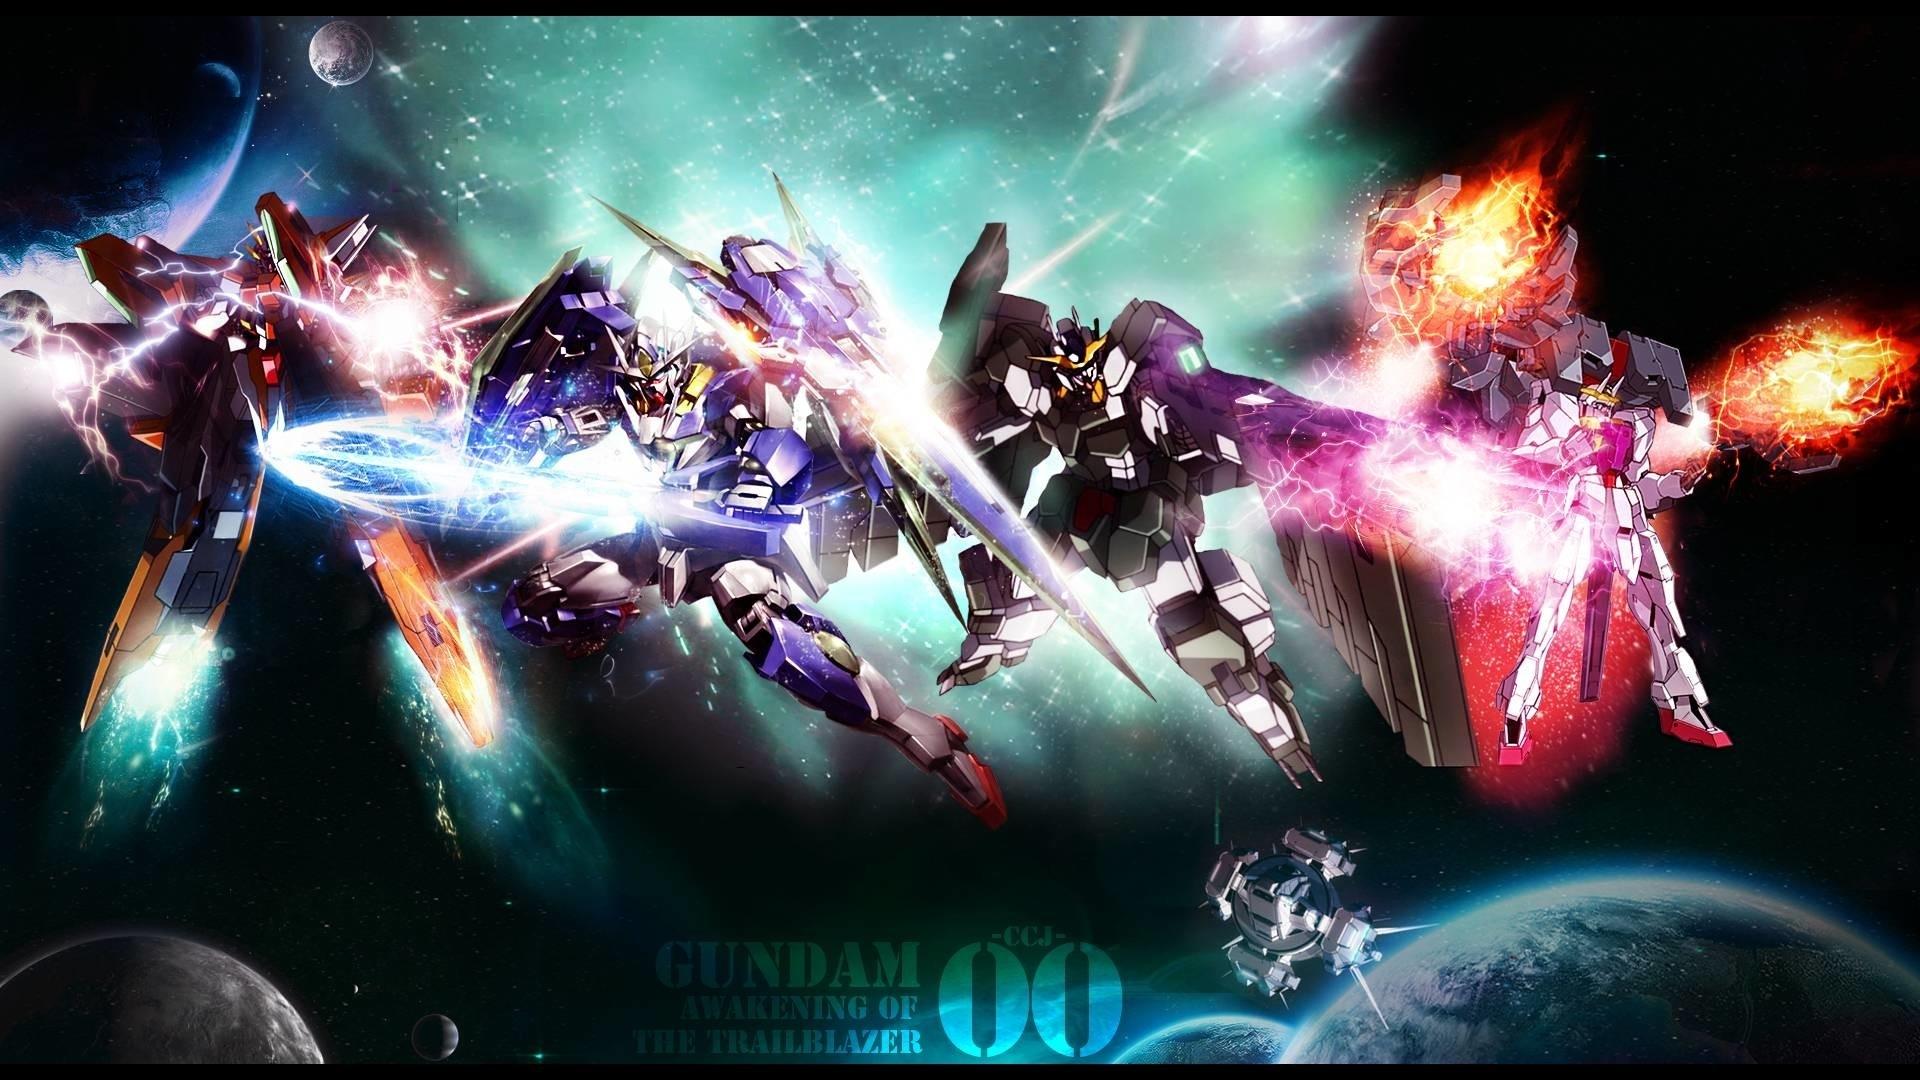 gundam 00 hd wallpaper (71+ images)